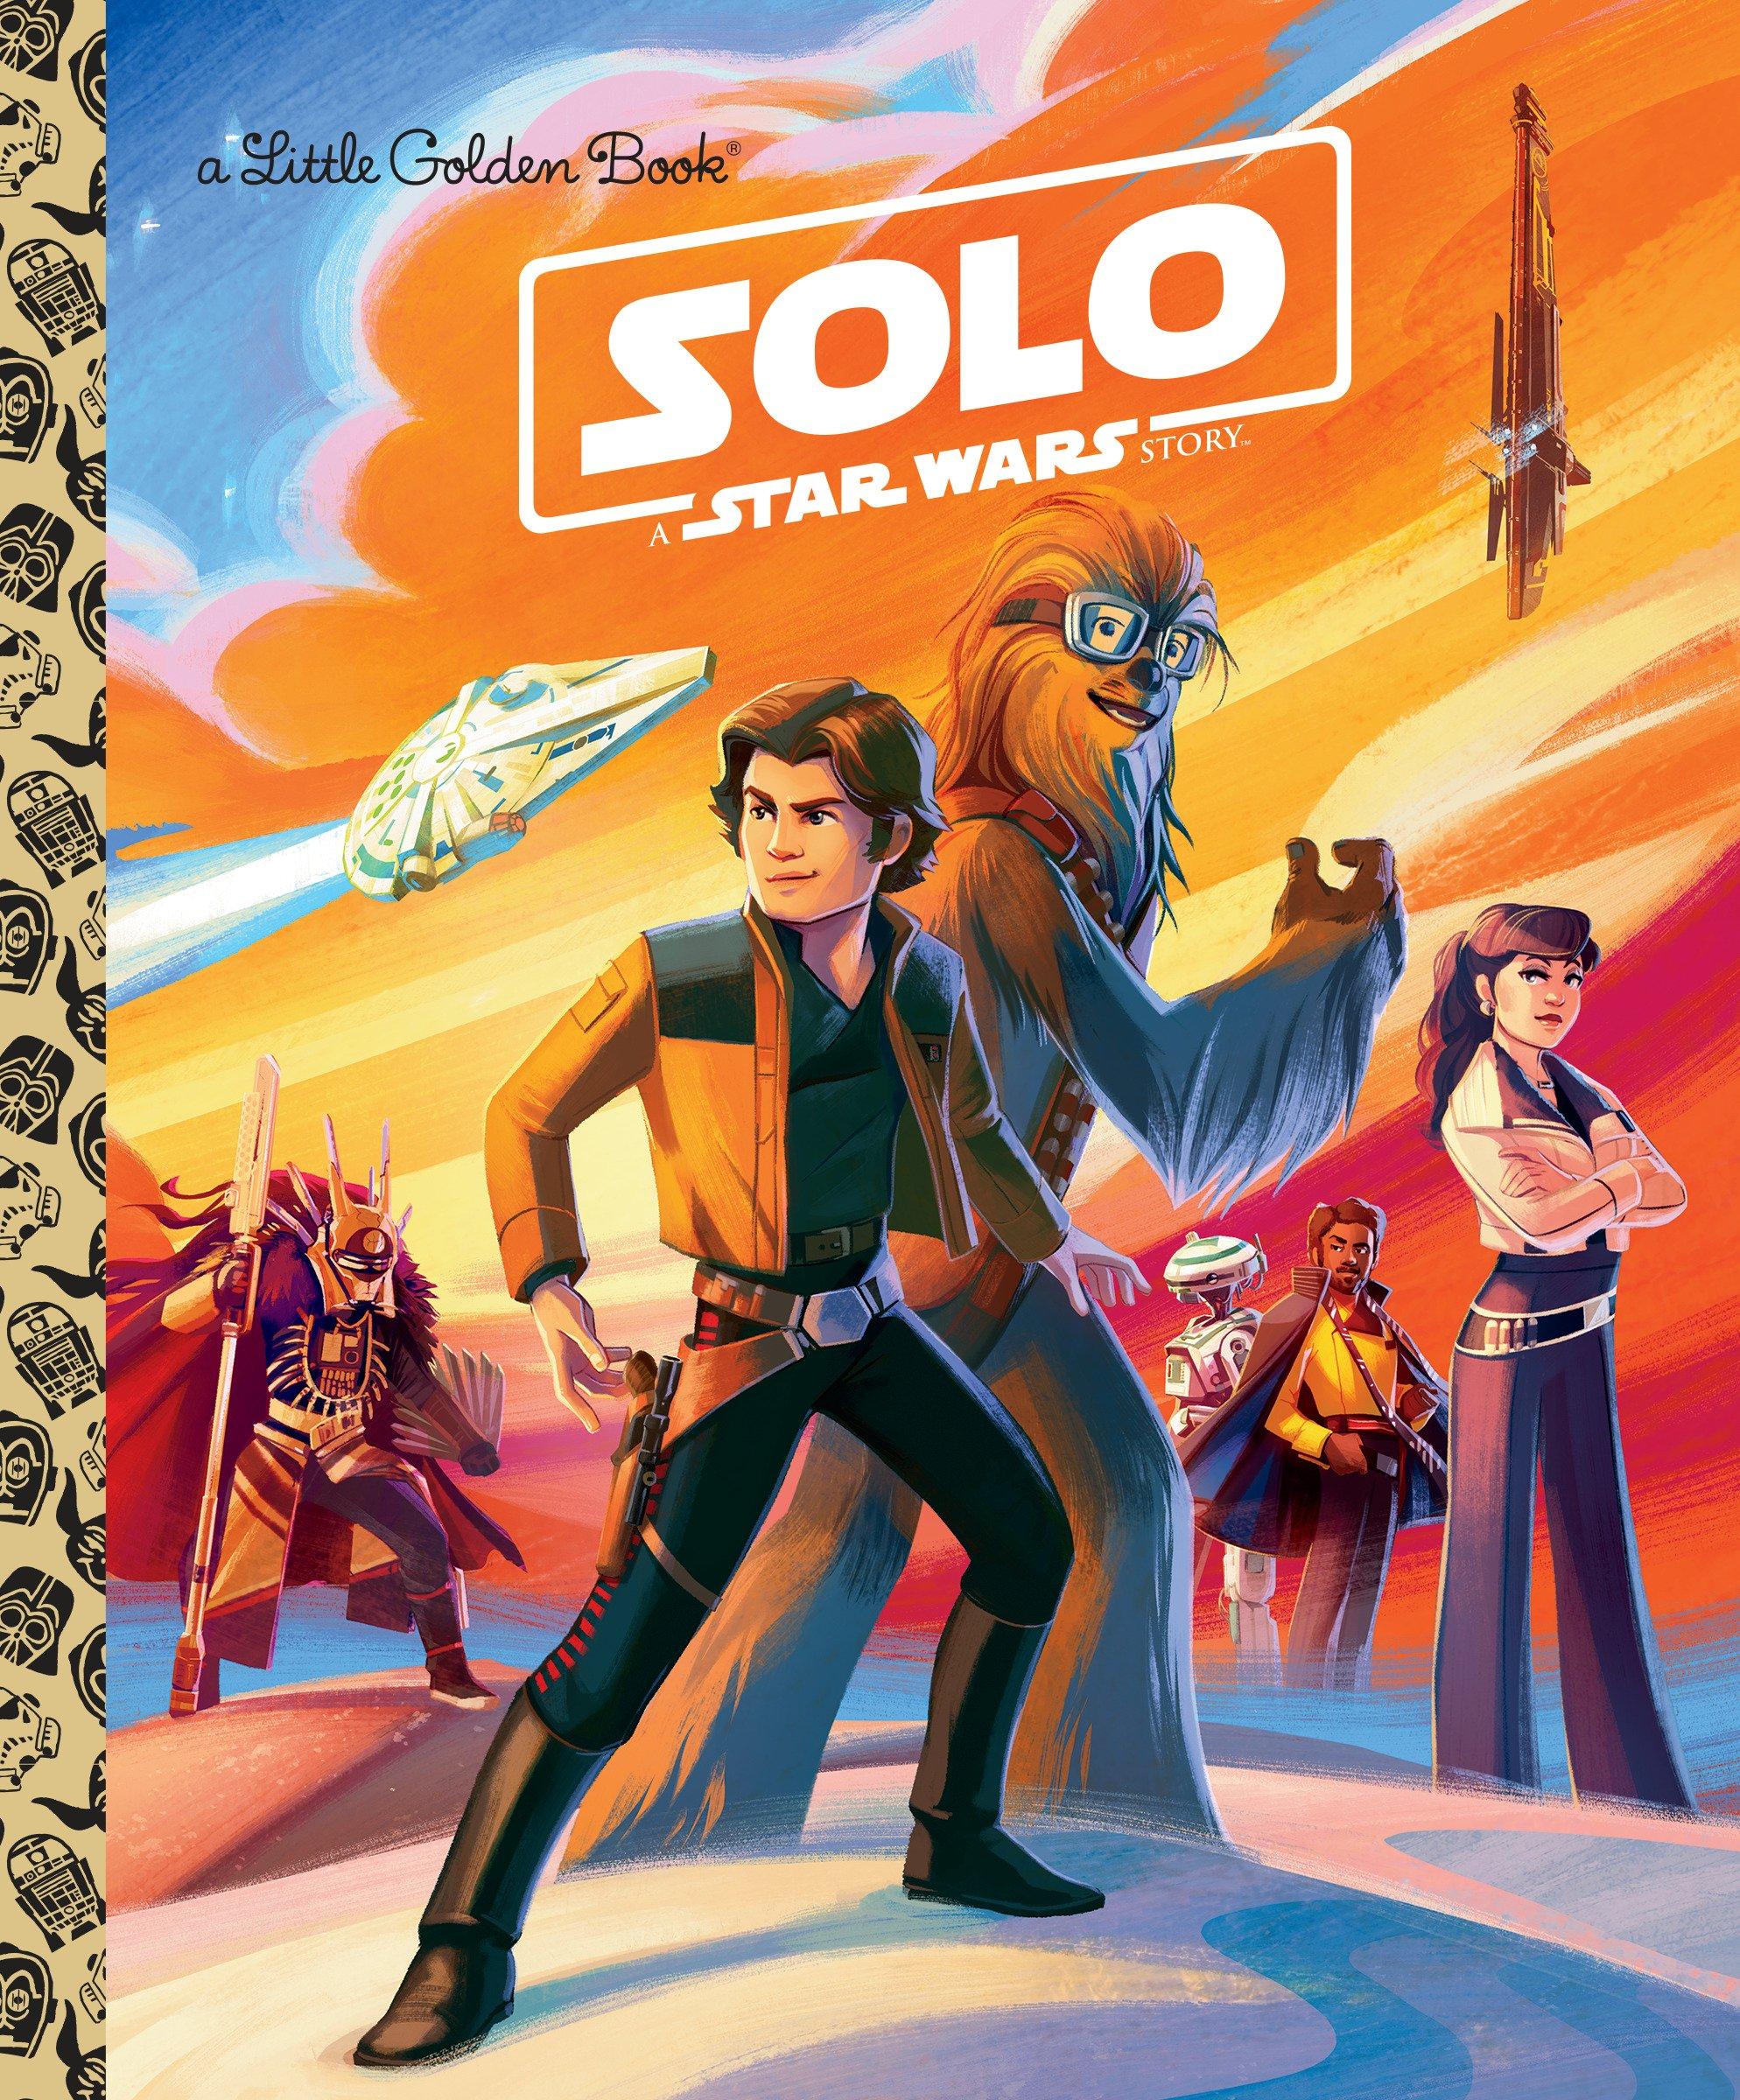 Solo: A Star Wars Story (Star Wars) (Little Golden Book): Elizabeth  Schaefer, Pilot Inc.: 9780736438759: Amazon.com: Books